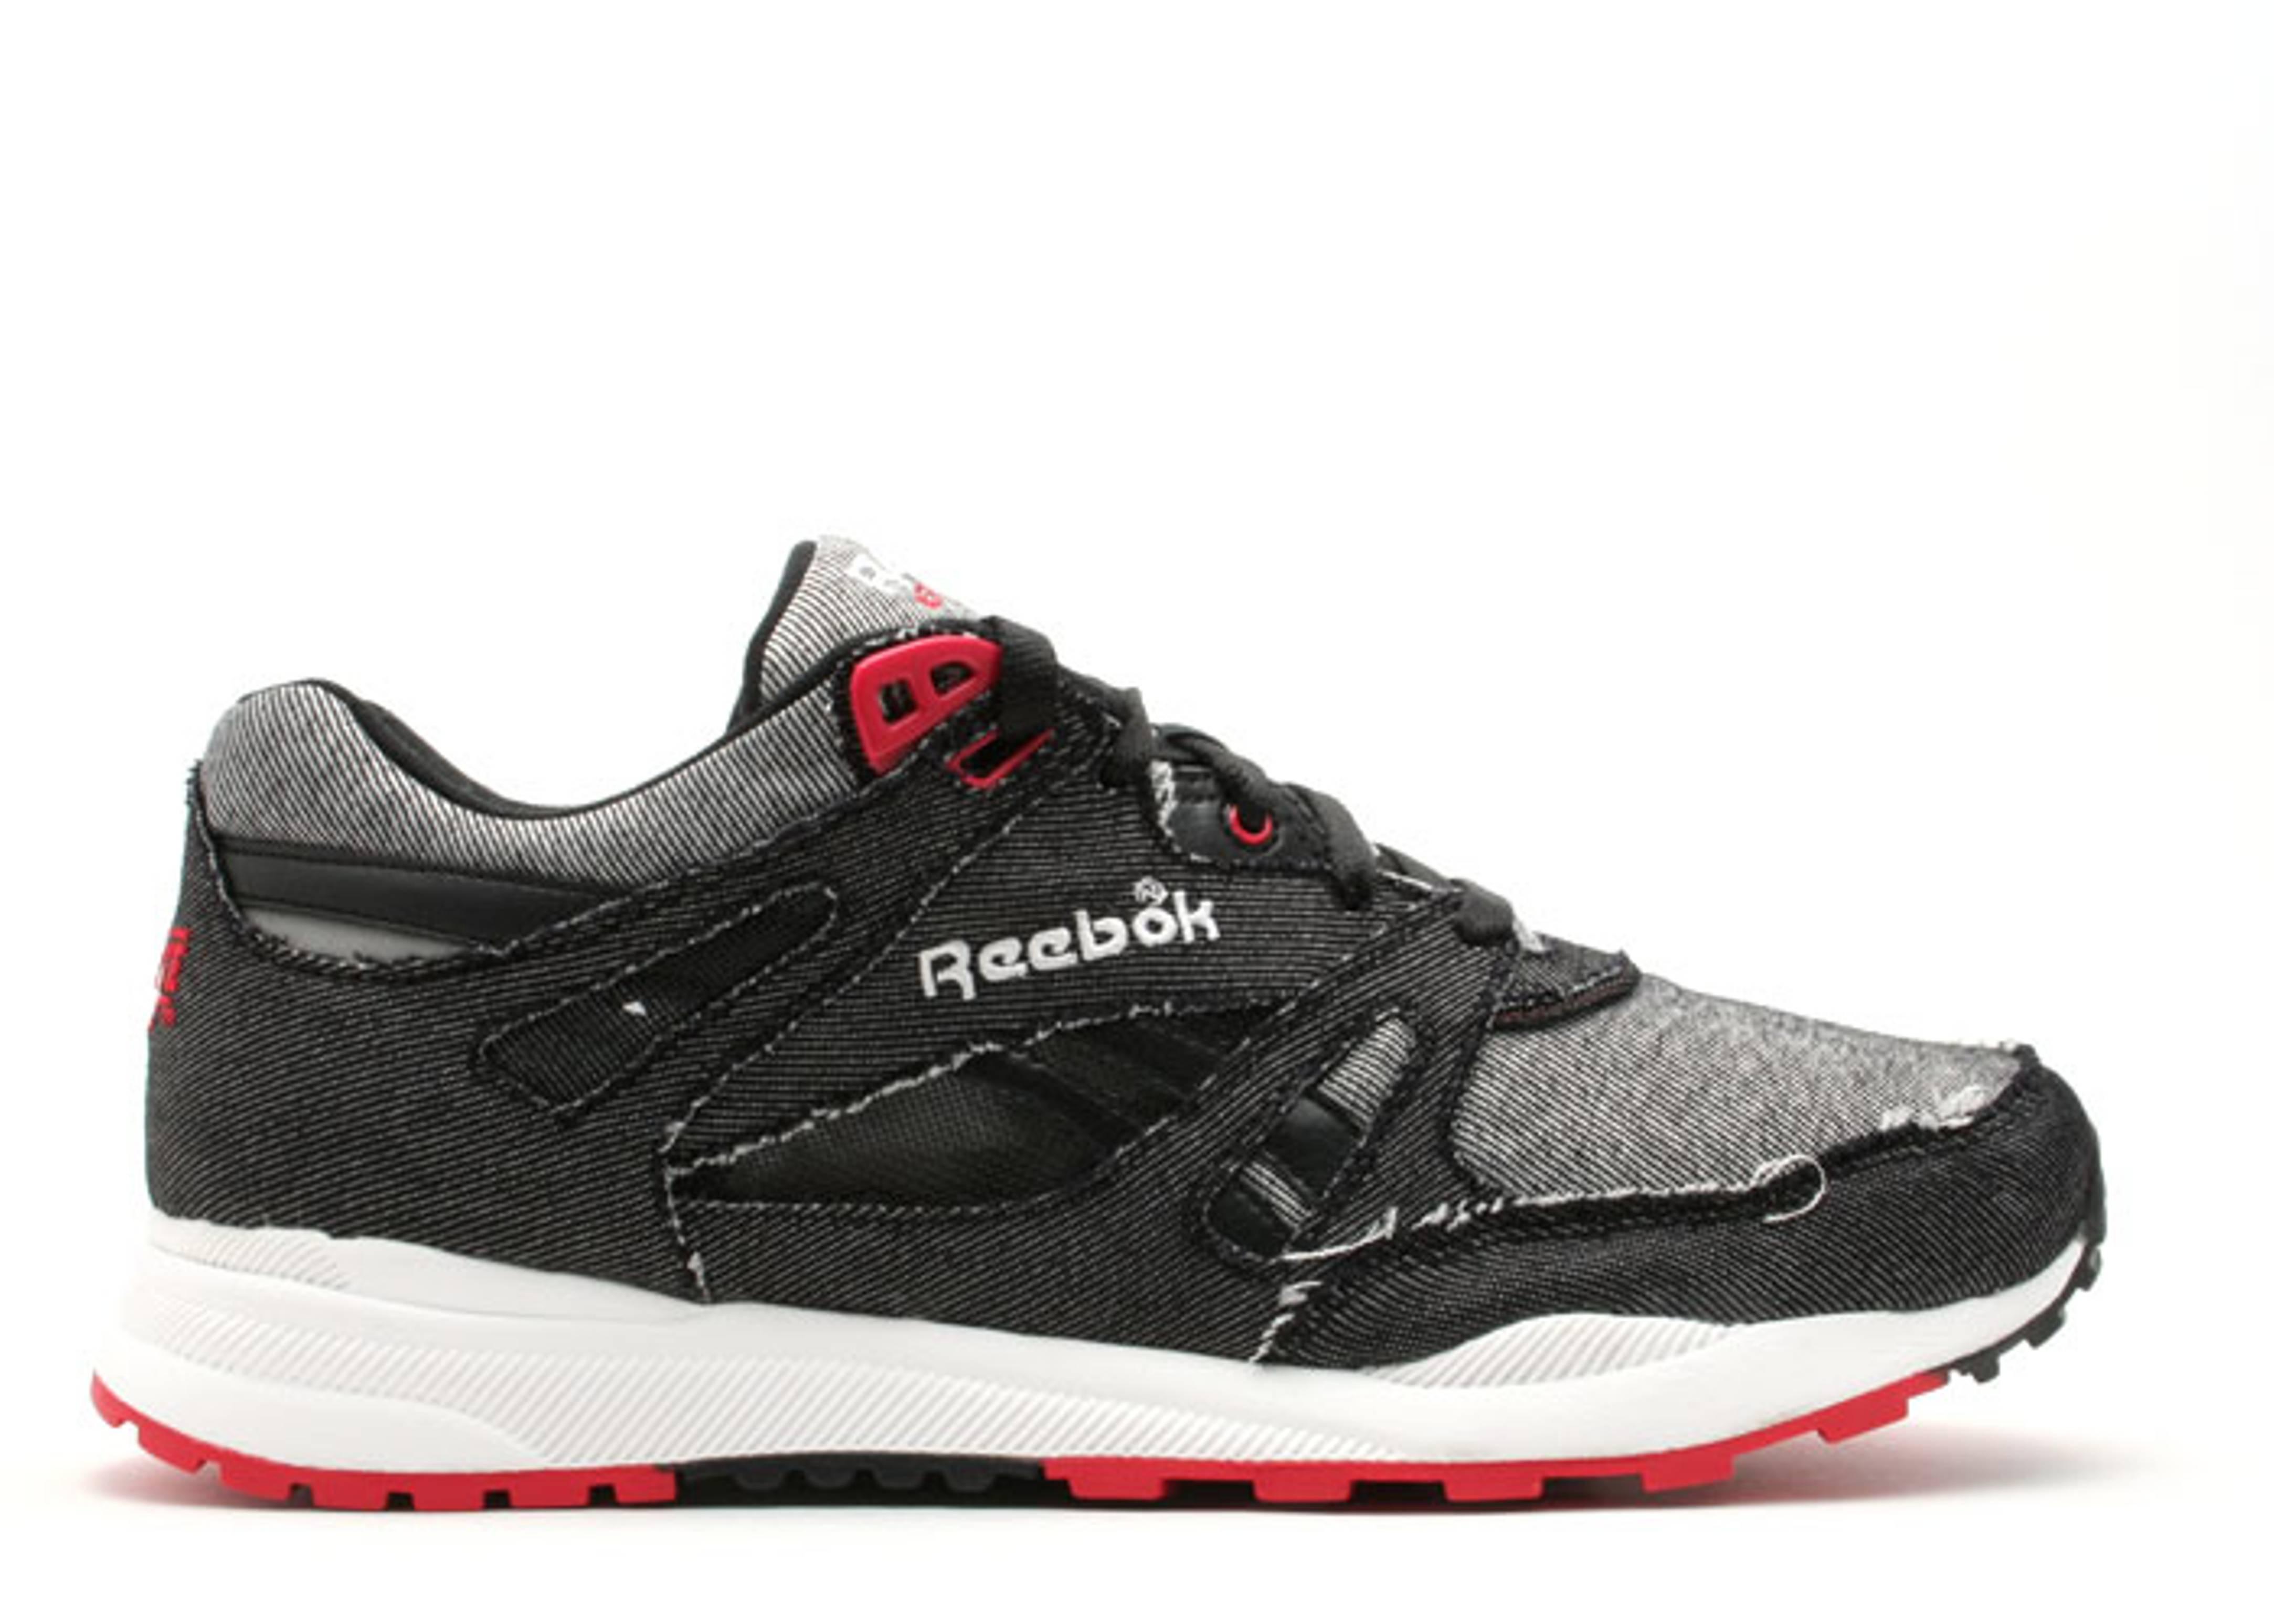 5c42ac62 Ventilator Denim - Reebok - 1151028 - black/white/eastern red ...